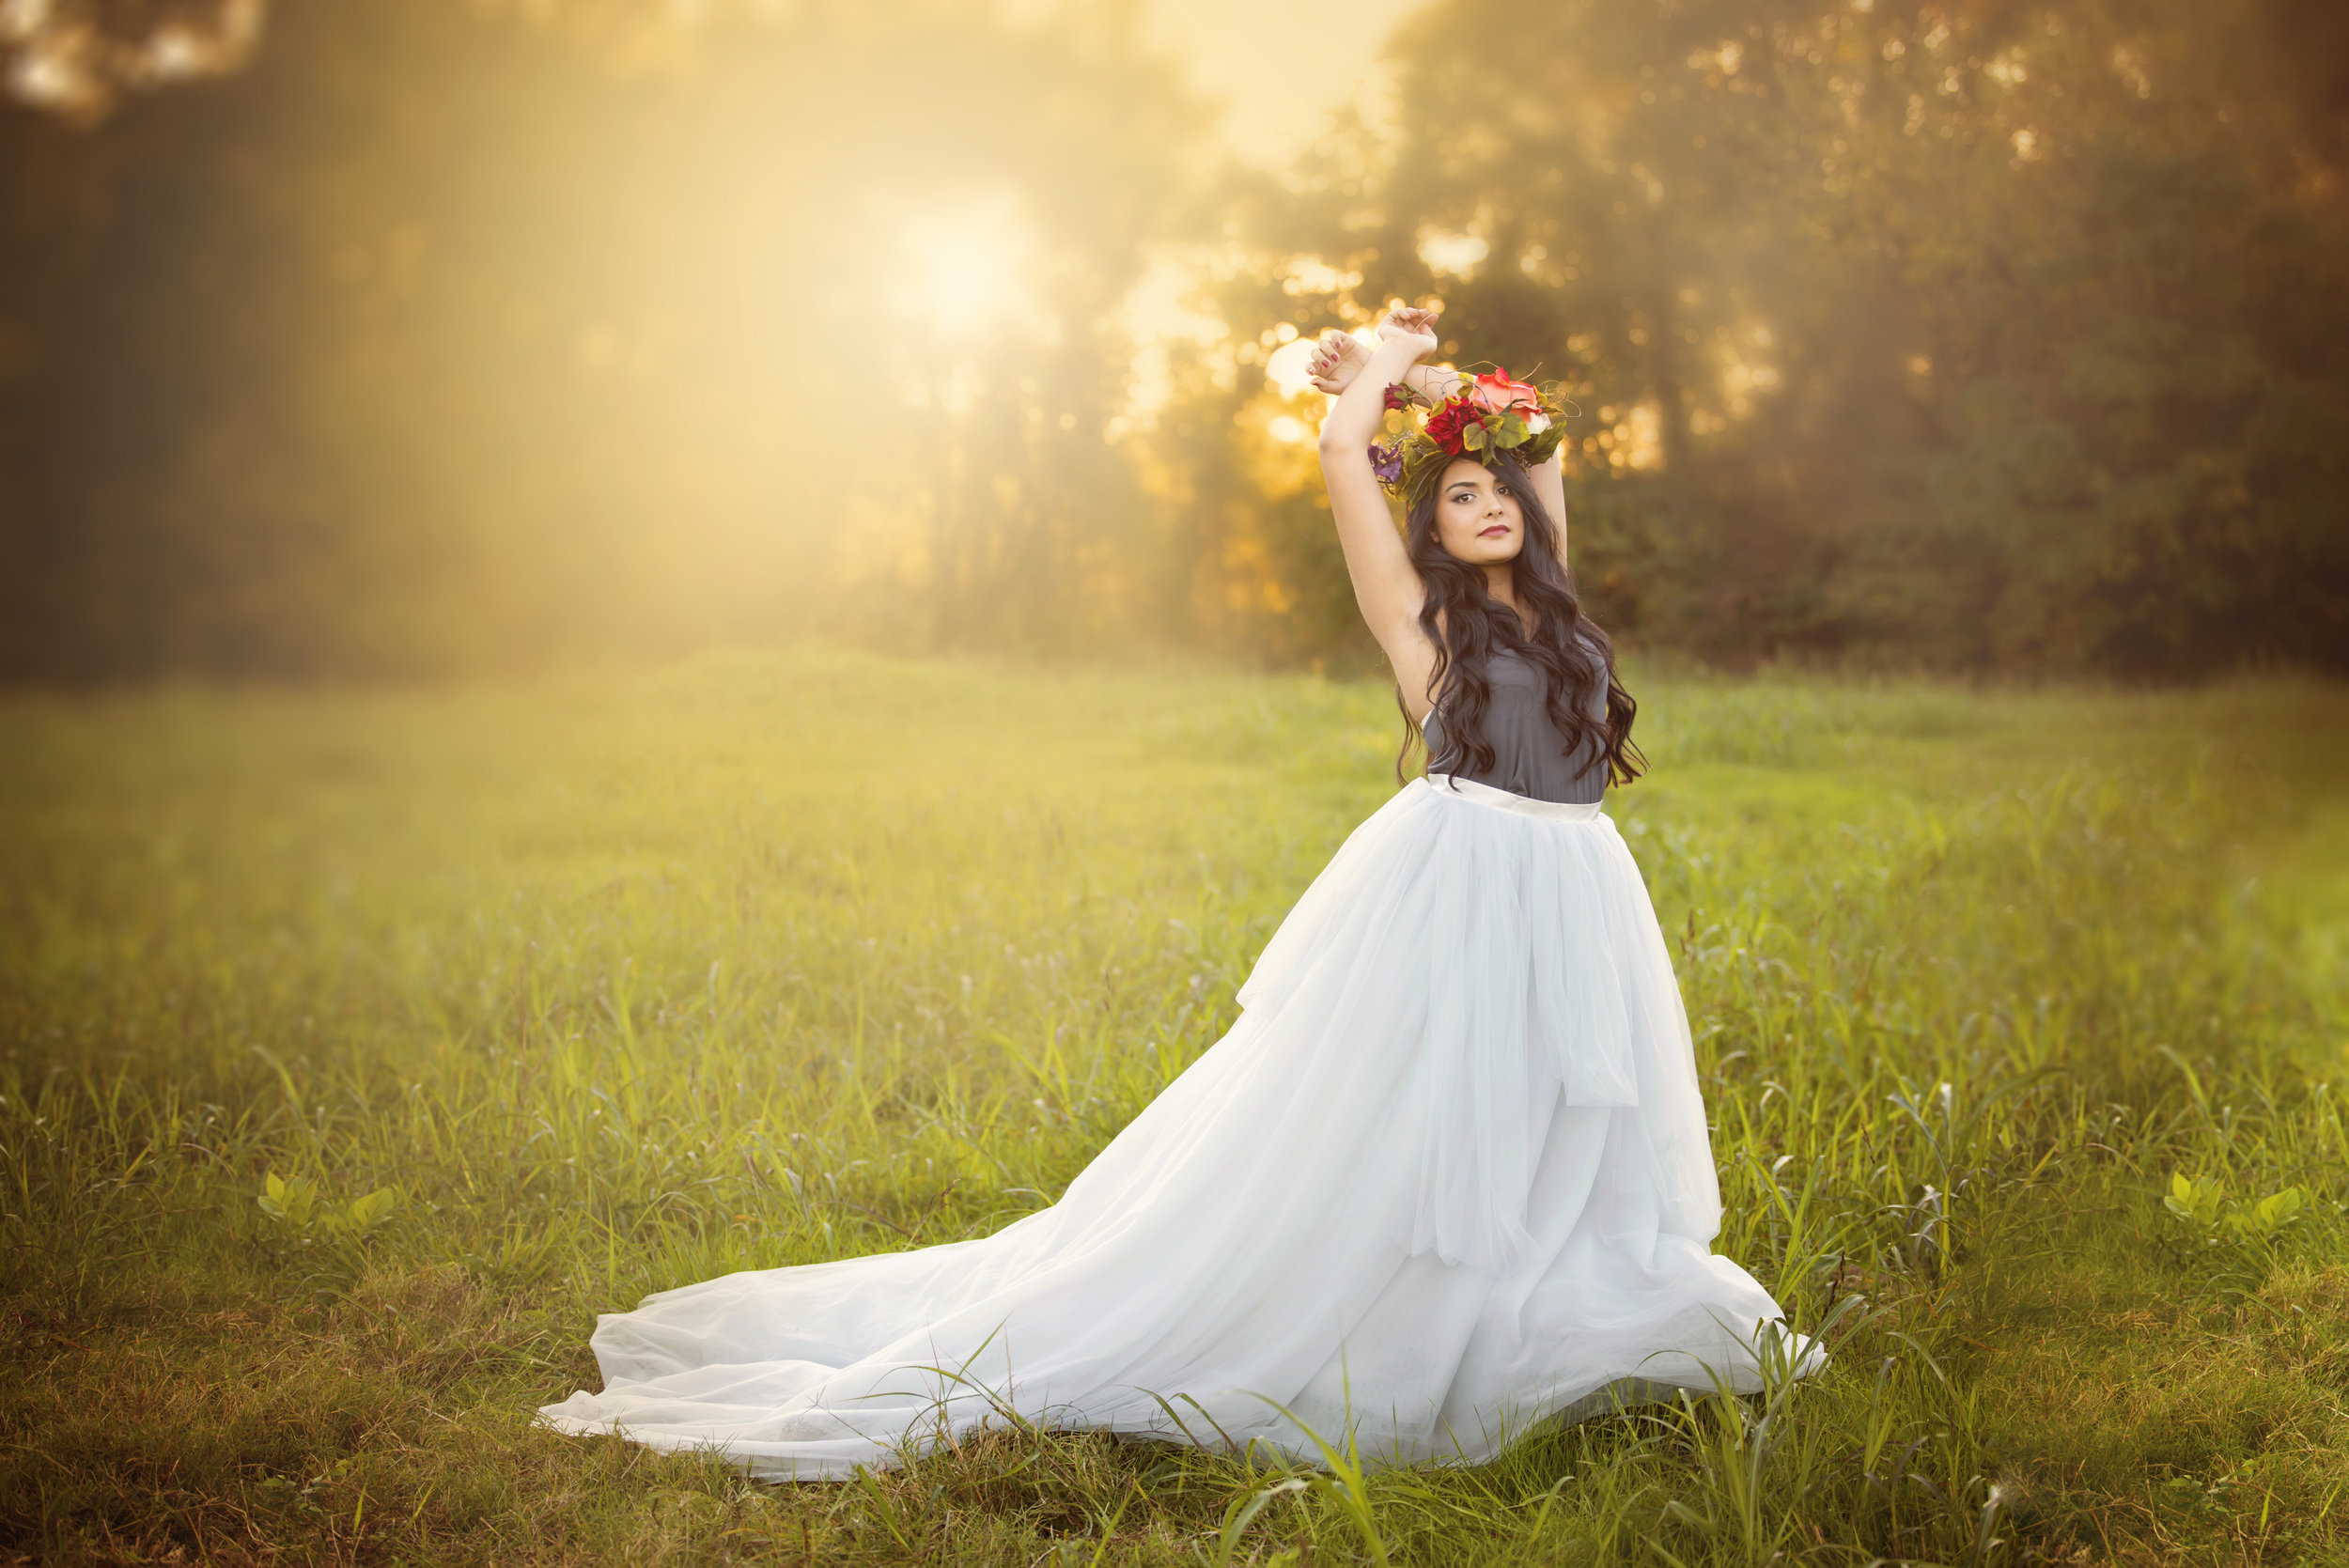 Reina-LeGrand-Photography-Photographer-Senior-azle-beauty-DFW-Dallas-Fort-Worth-Denton-Southlake-Colleyville-Grapevine-Roanoke-Keller-Westlake-Portrait-Portraiture-Photo-Session-y-argyle-2.jpg